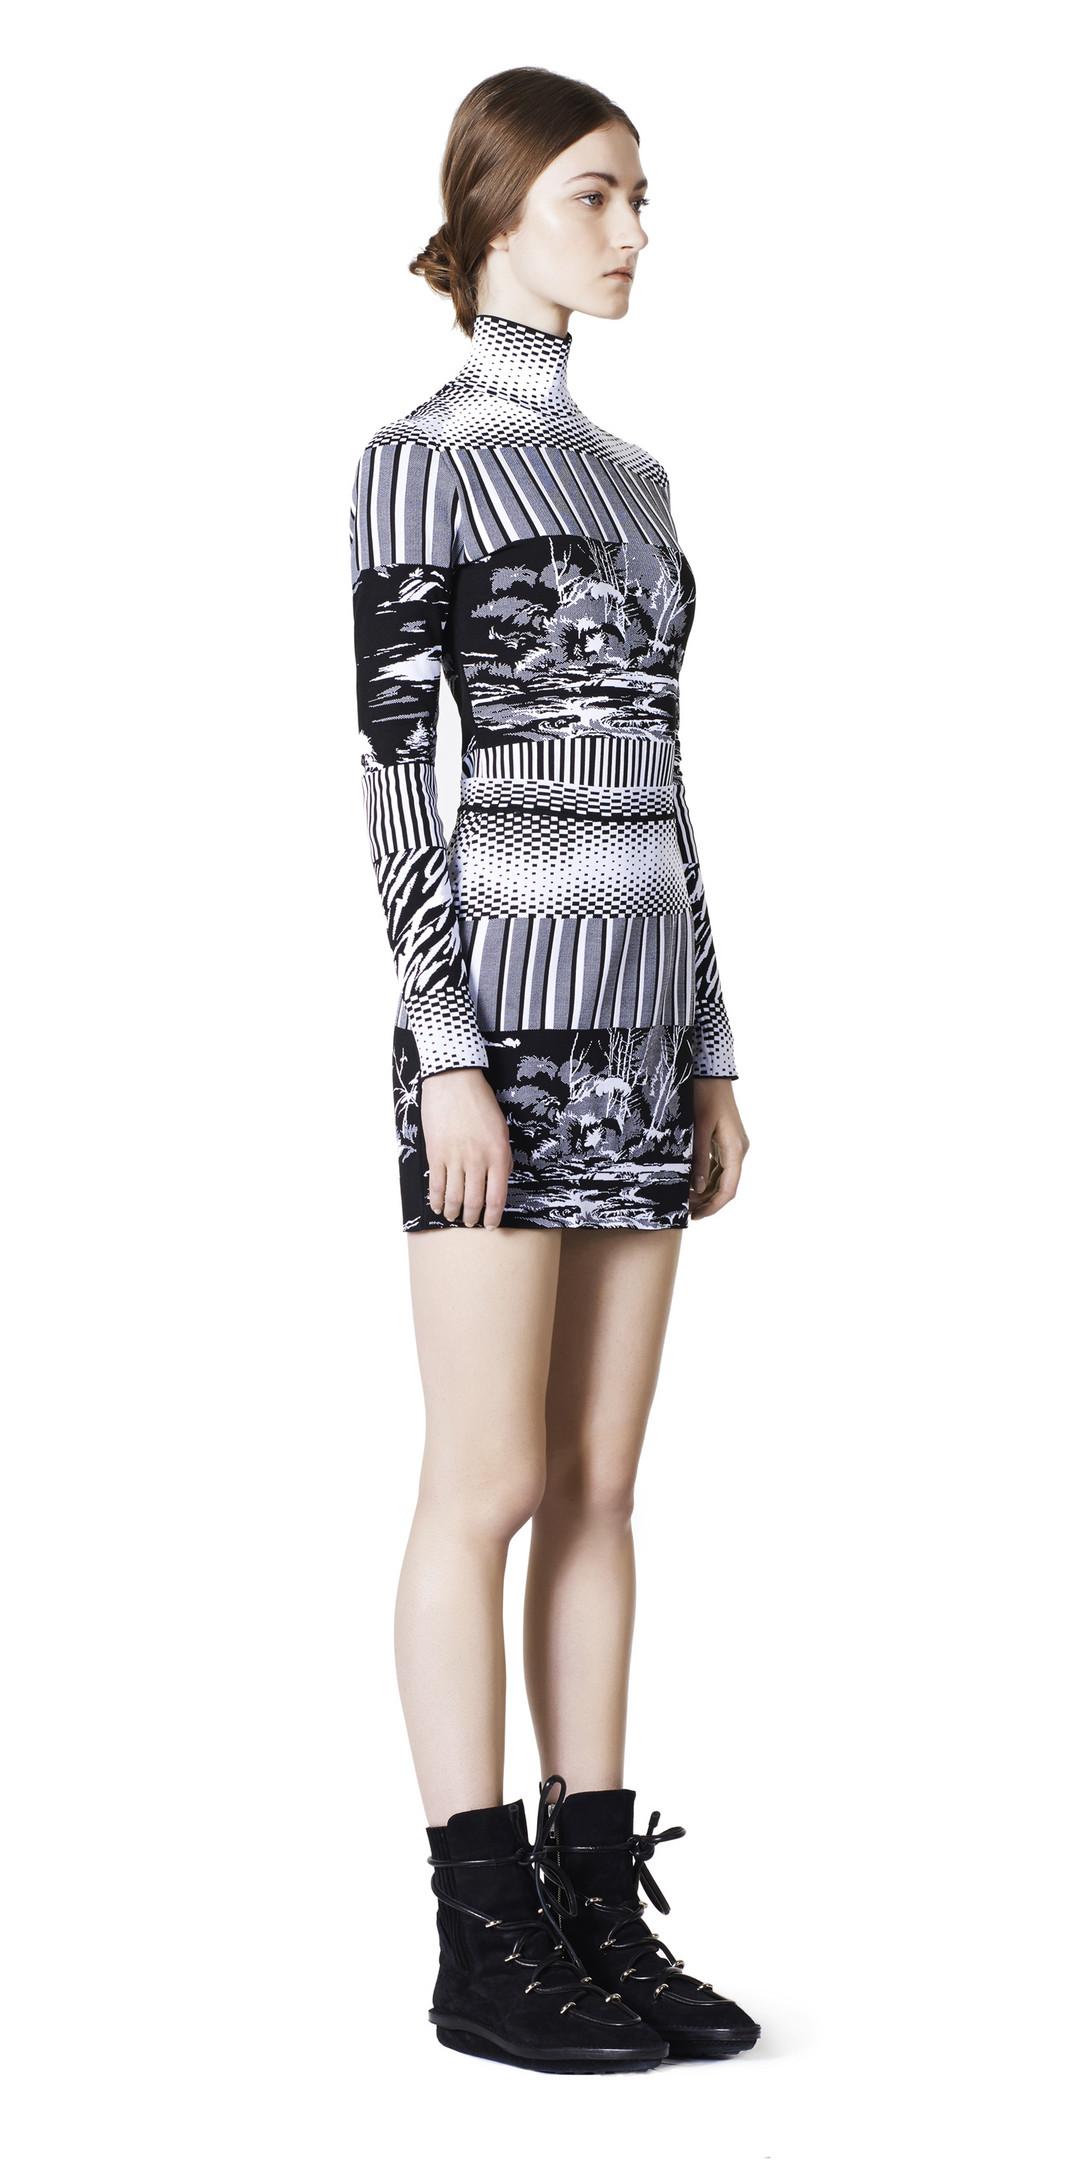 BALENCIAGA Balenciaga Ski Mini Skirt Skirt D f